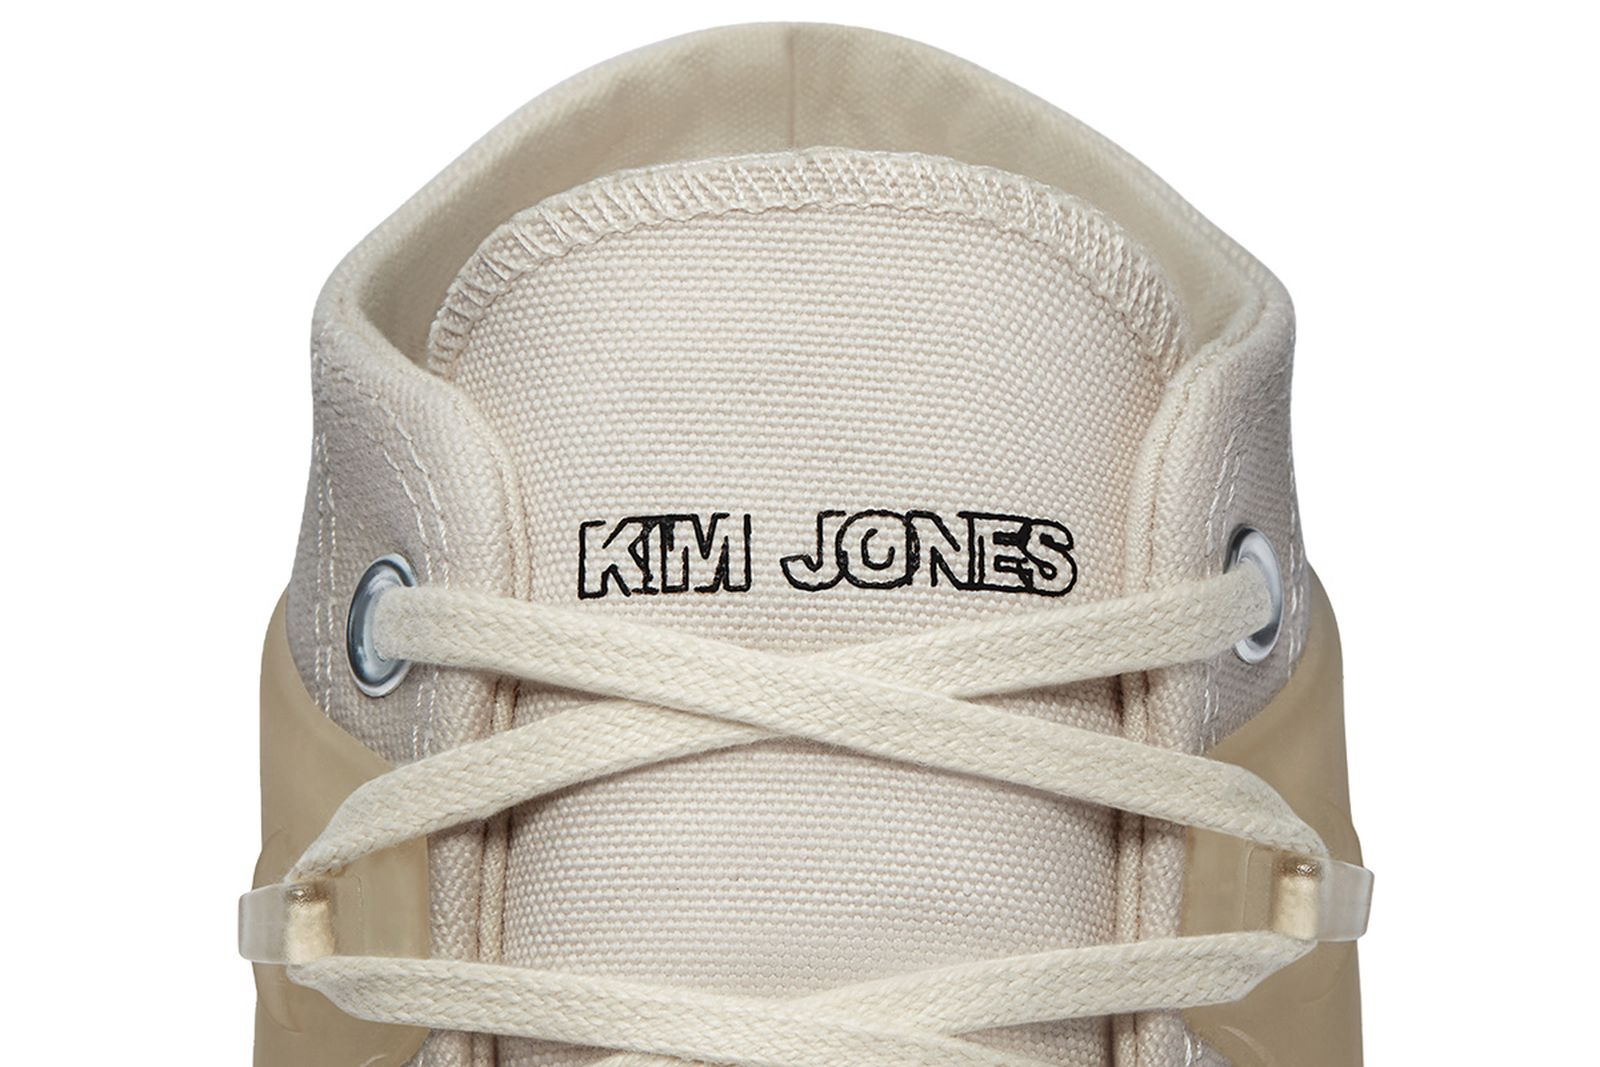 kim-jones-converse-chuck-70-release-date-price-05